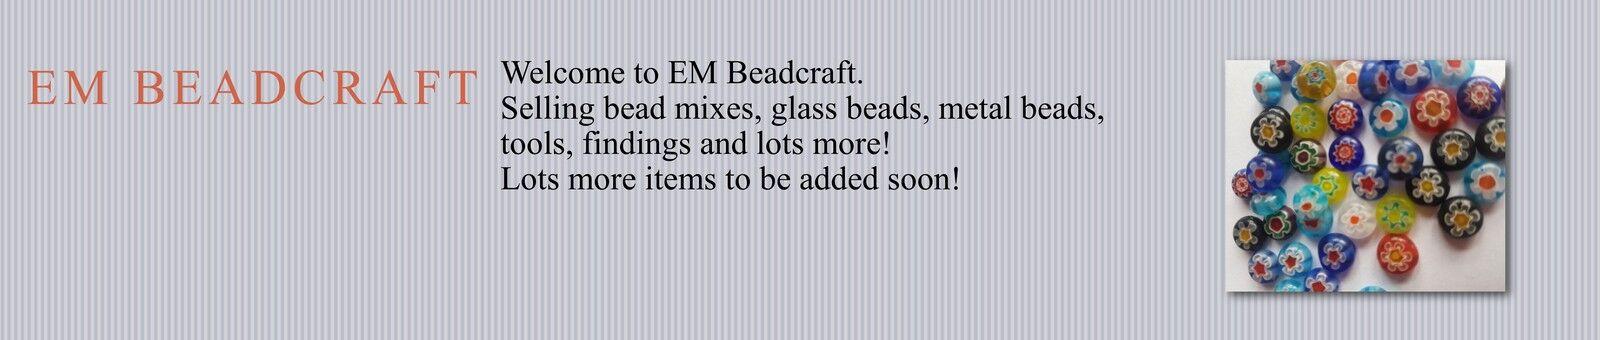 EM Beadcraft